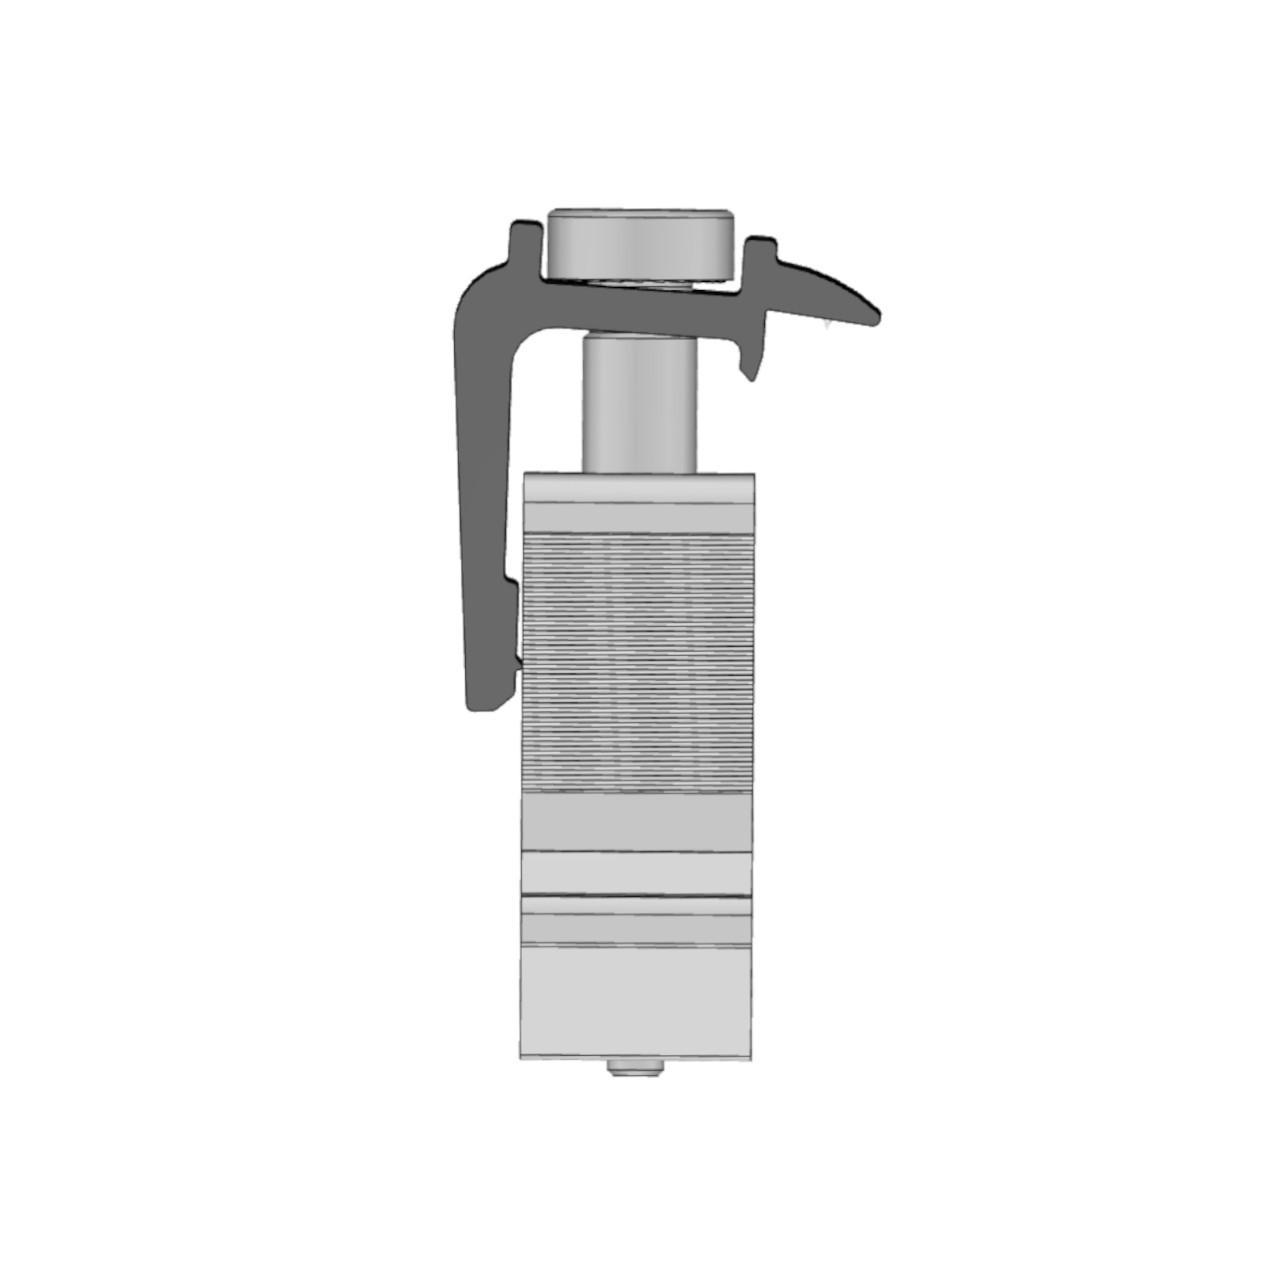 Schletter - Rapid16 End Clamp - Profile